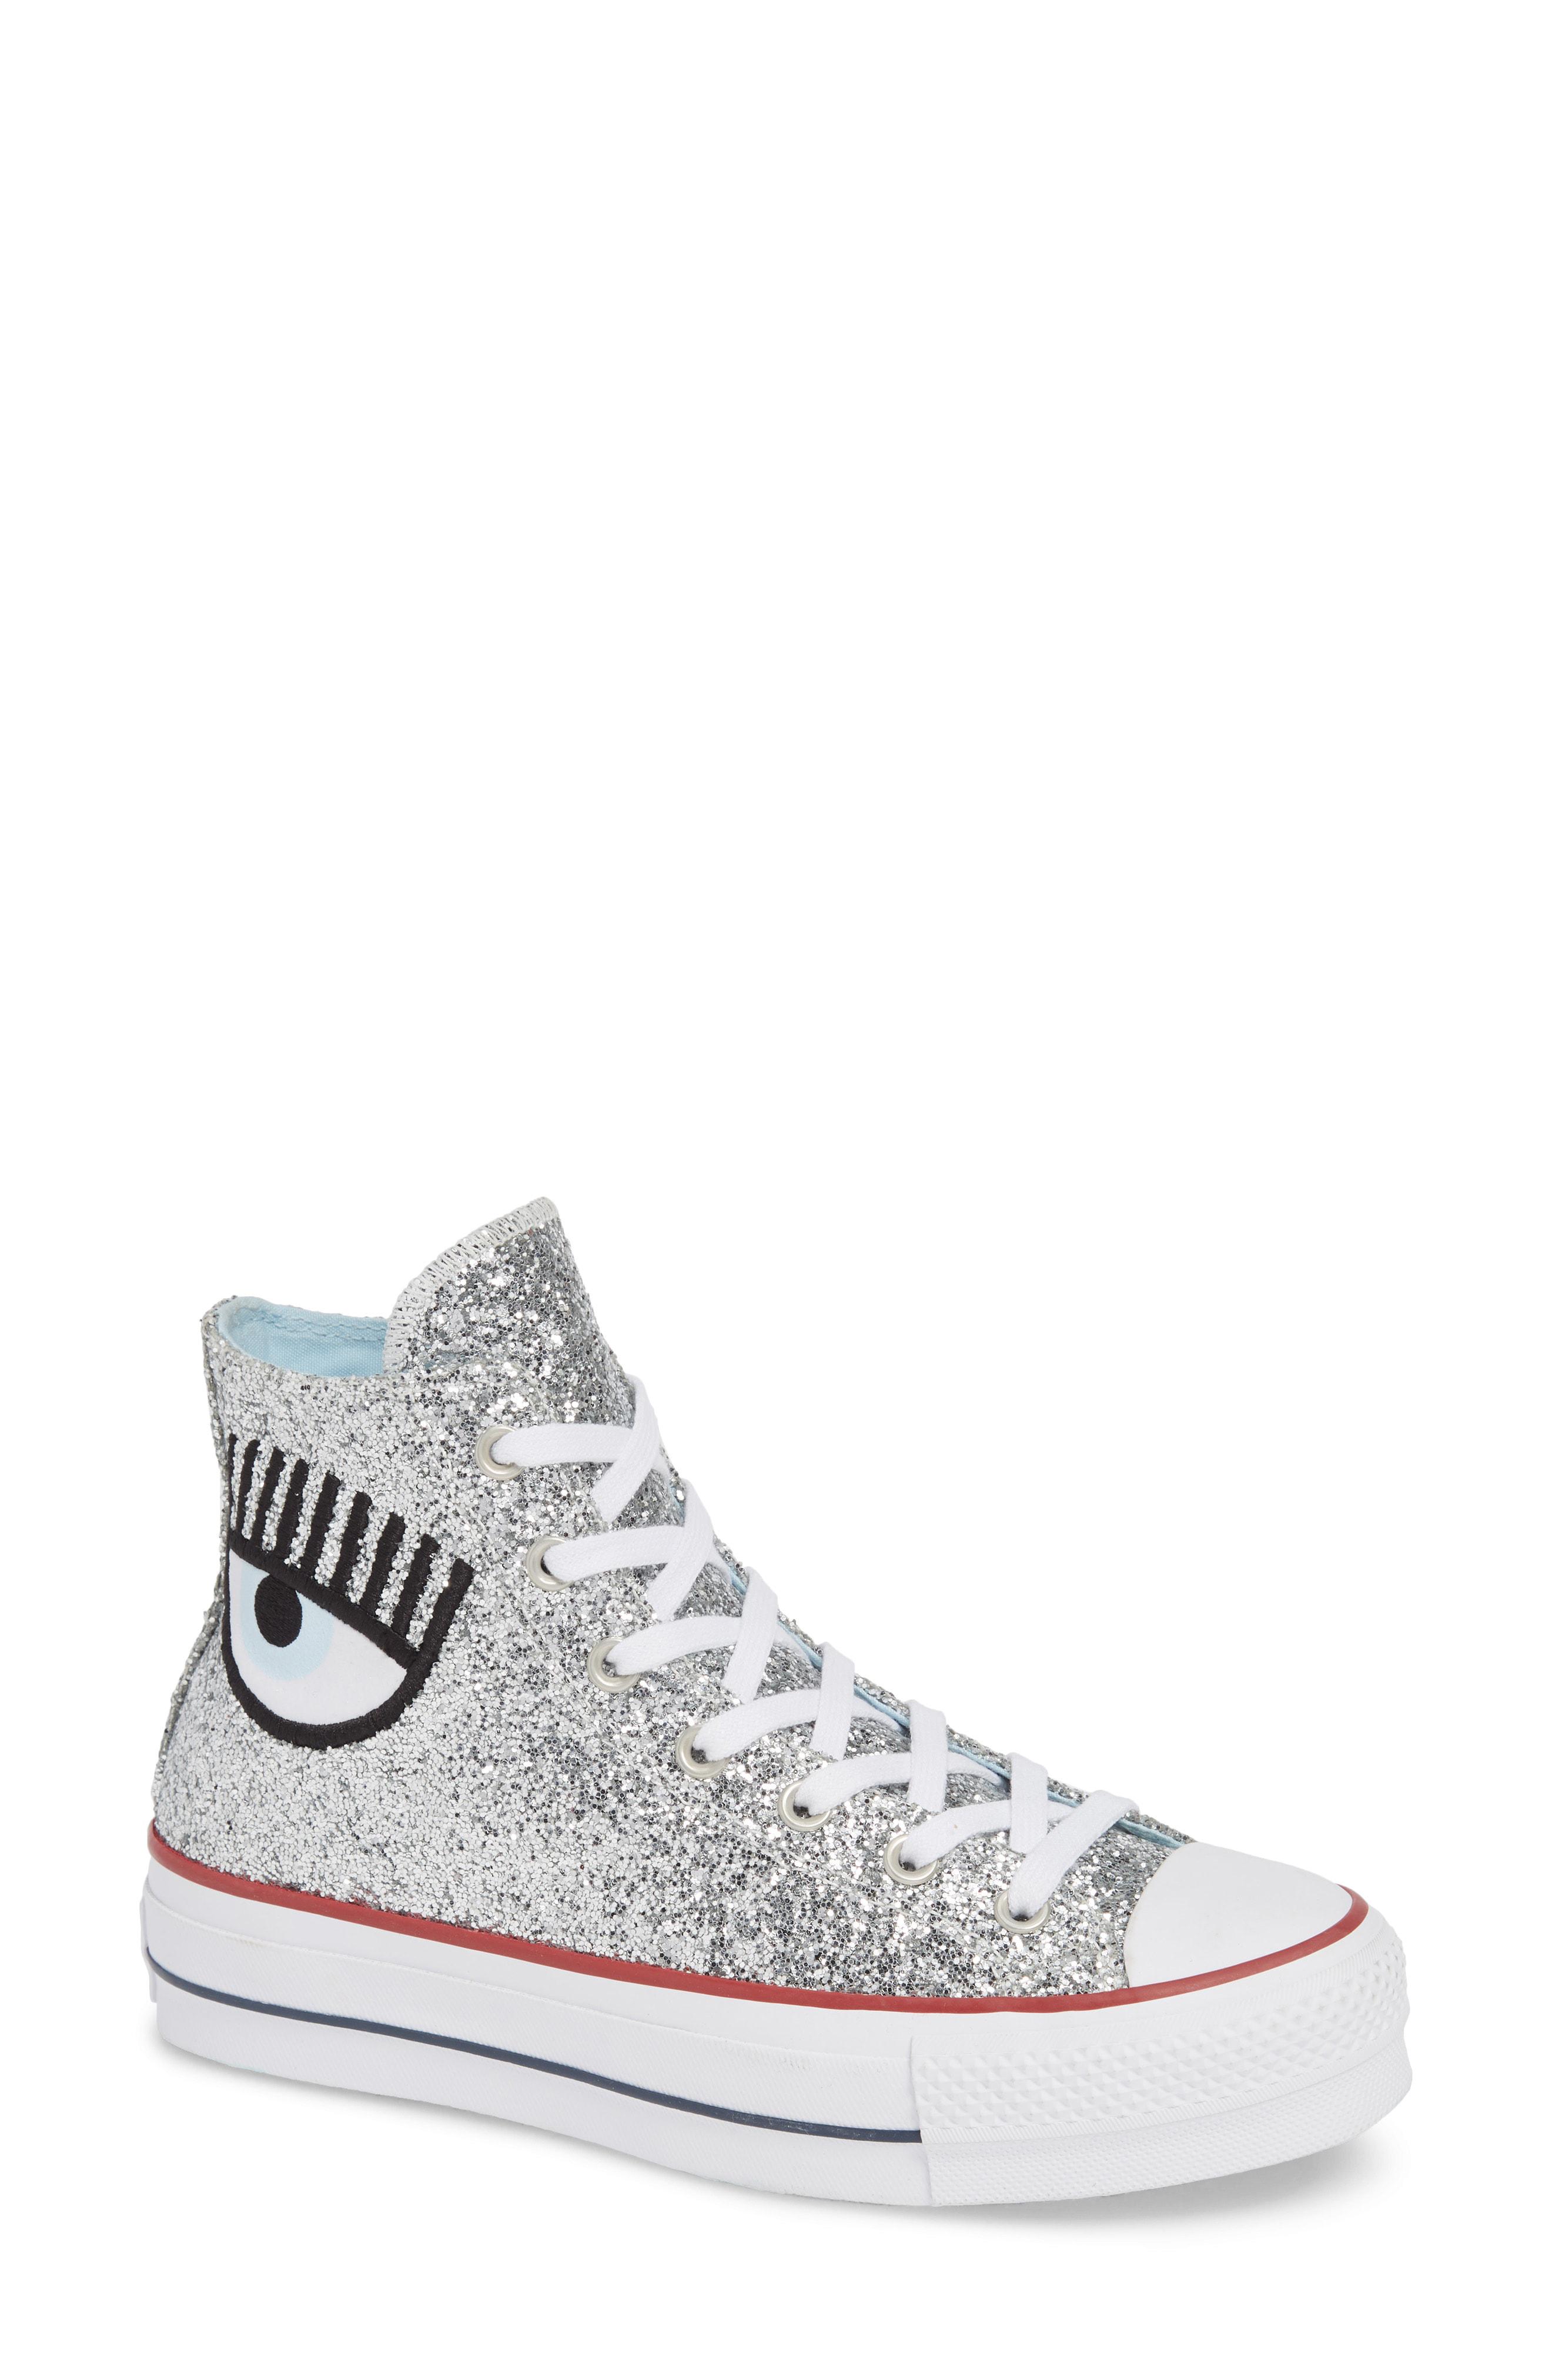 a7b6e0b825c4 Converse X Chiara Ferragni Women s Chuck Taylor Glitter High Top Sneakers  In Silver Glitter